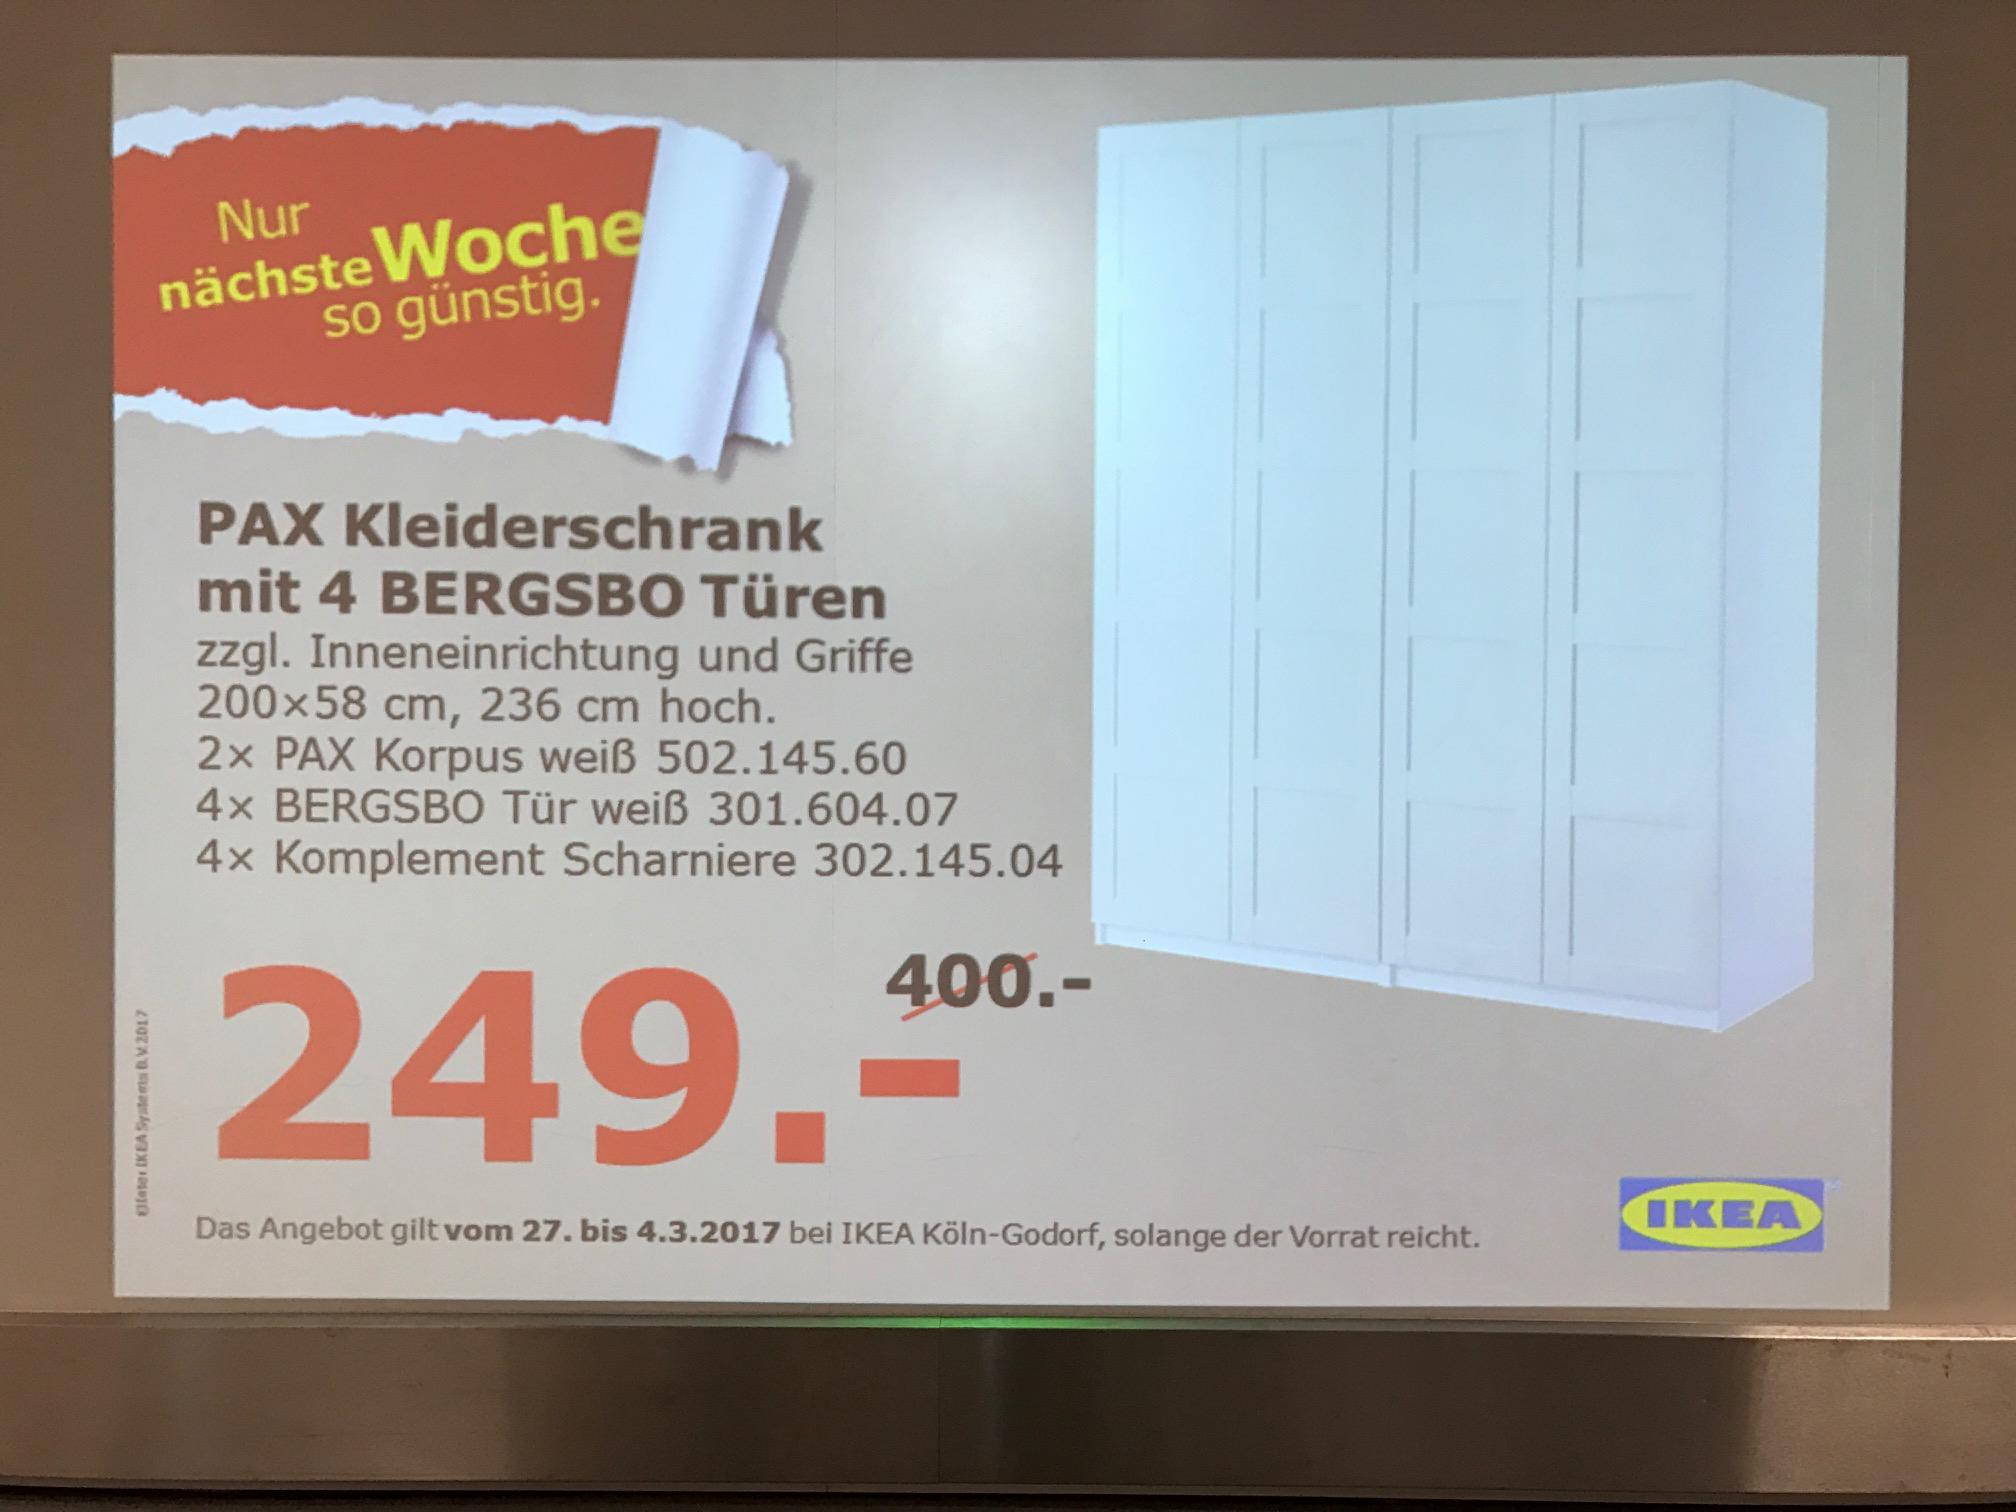 ikea pax kleiderschrank 200x58x236cm mit bergsbo t ren. Black Bedroom Furniture Sets. Home Design Ideas